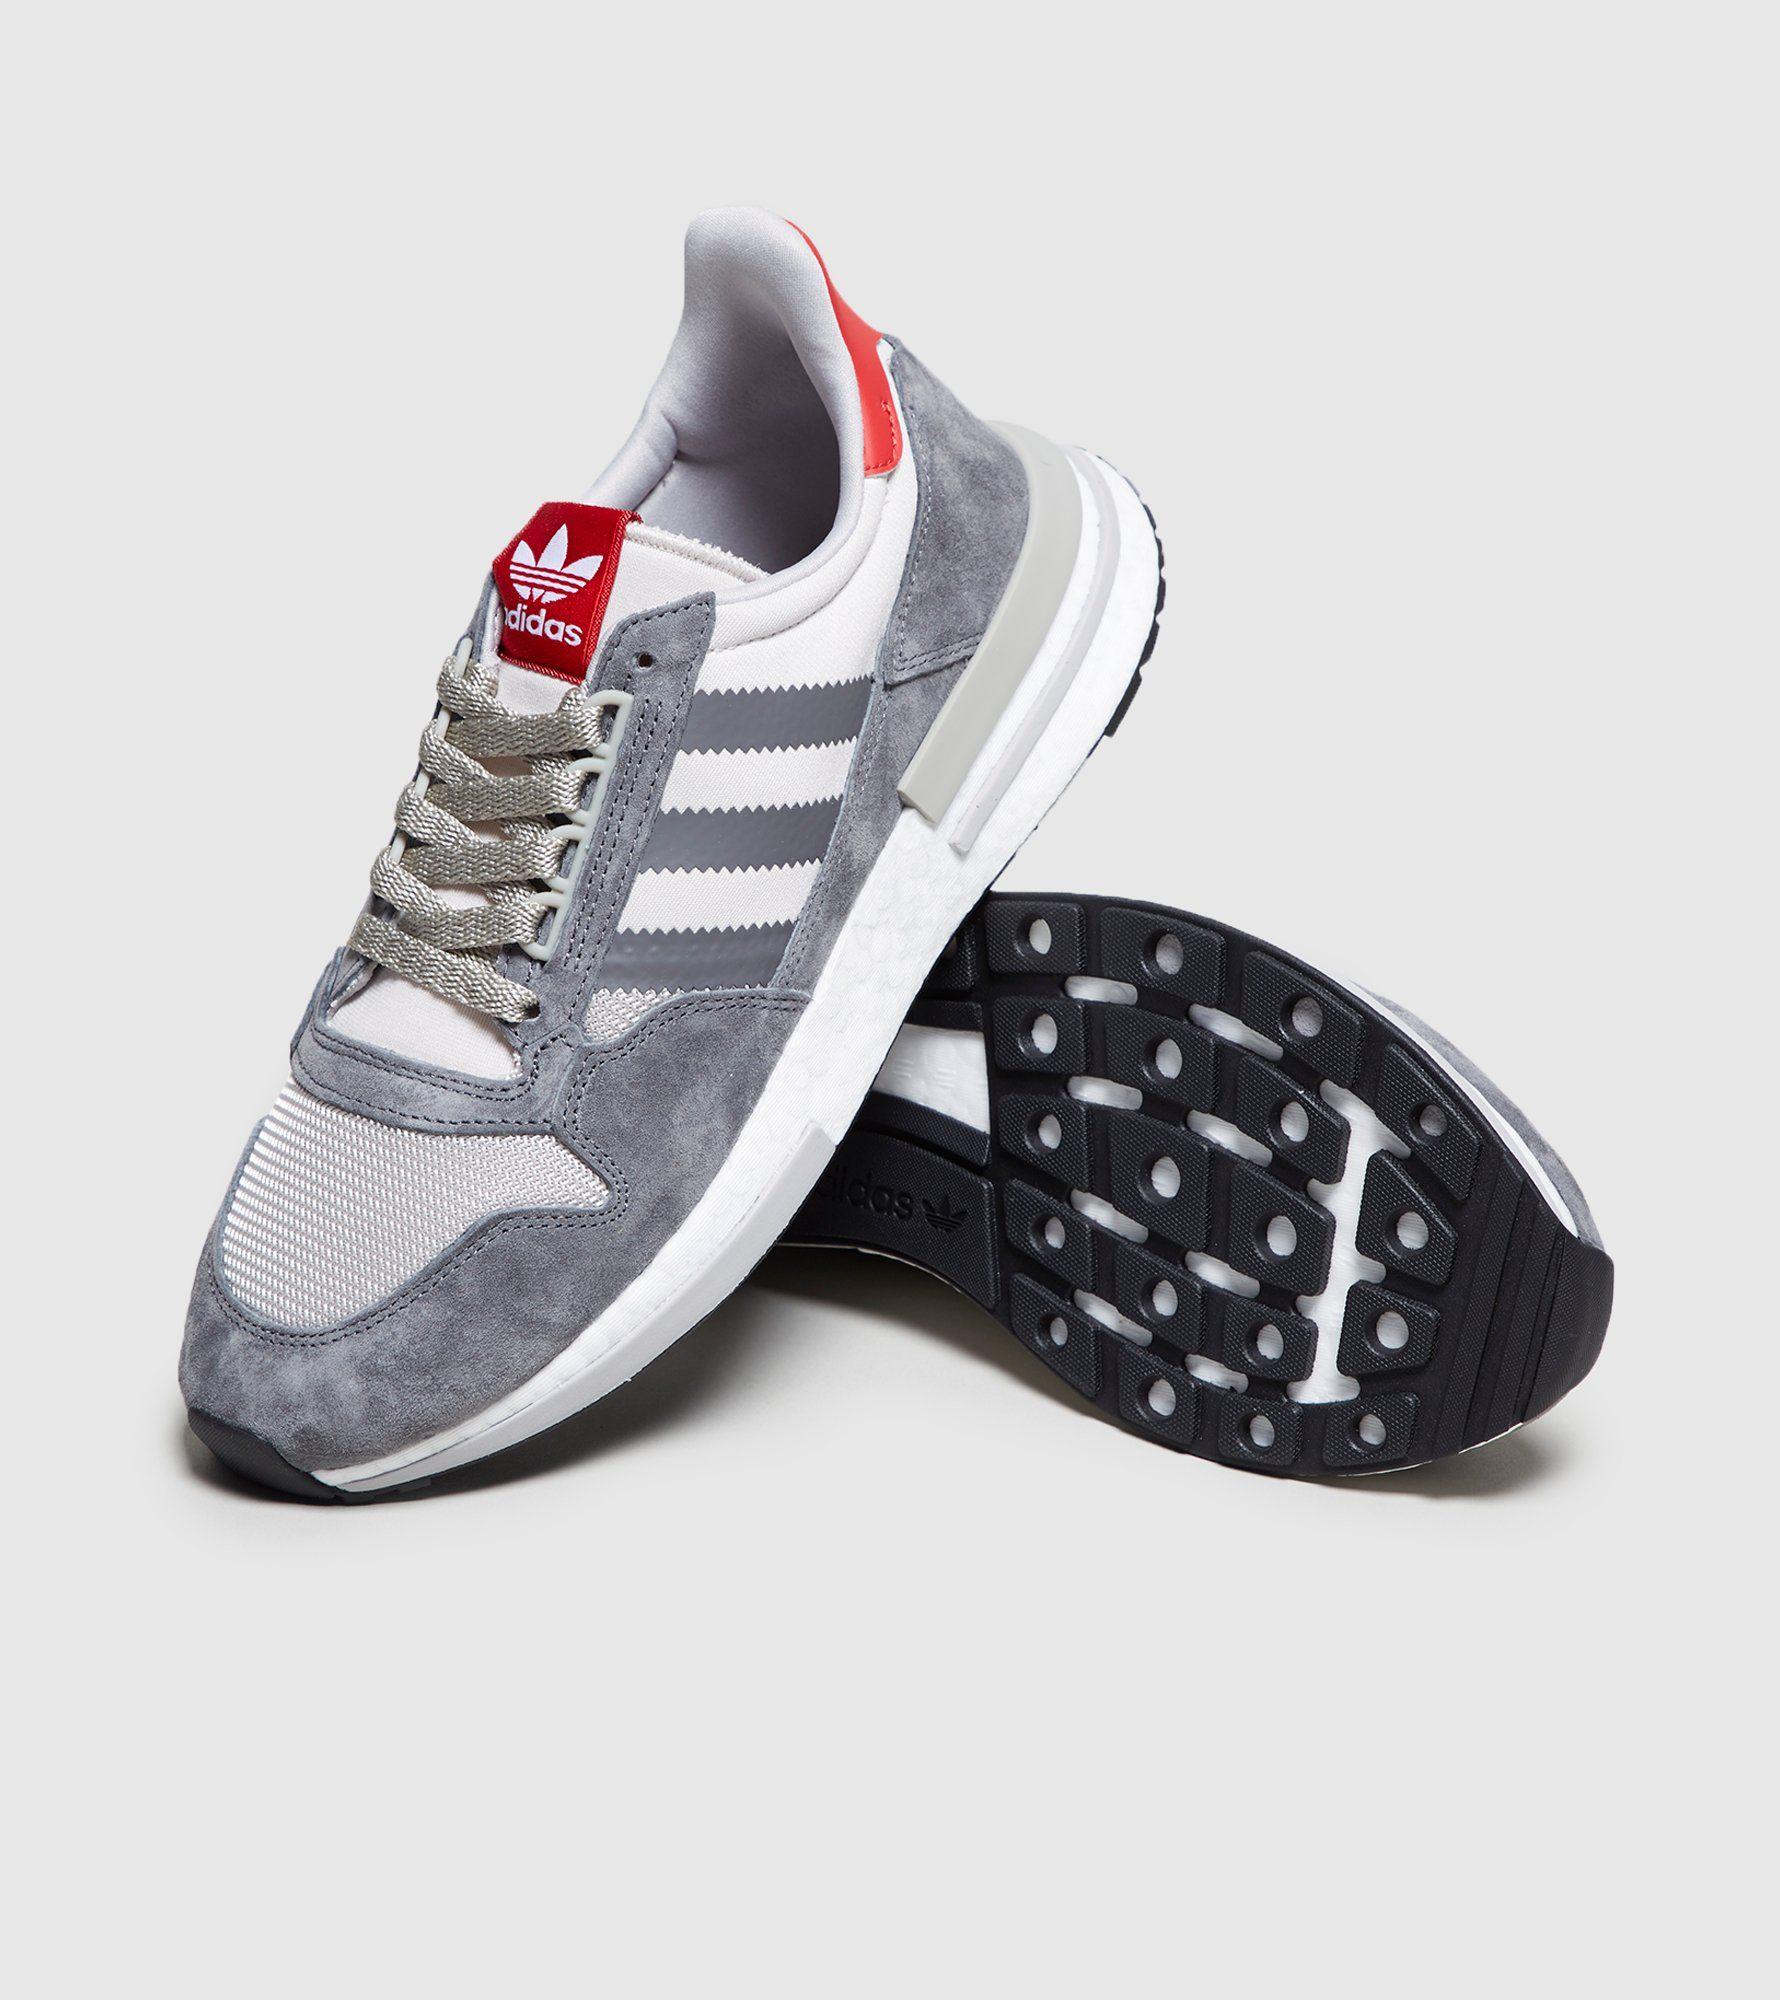 4623c30adbef9 ... sale adidas originals zx500 og boost 67b10 40216